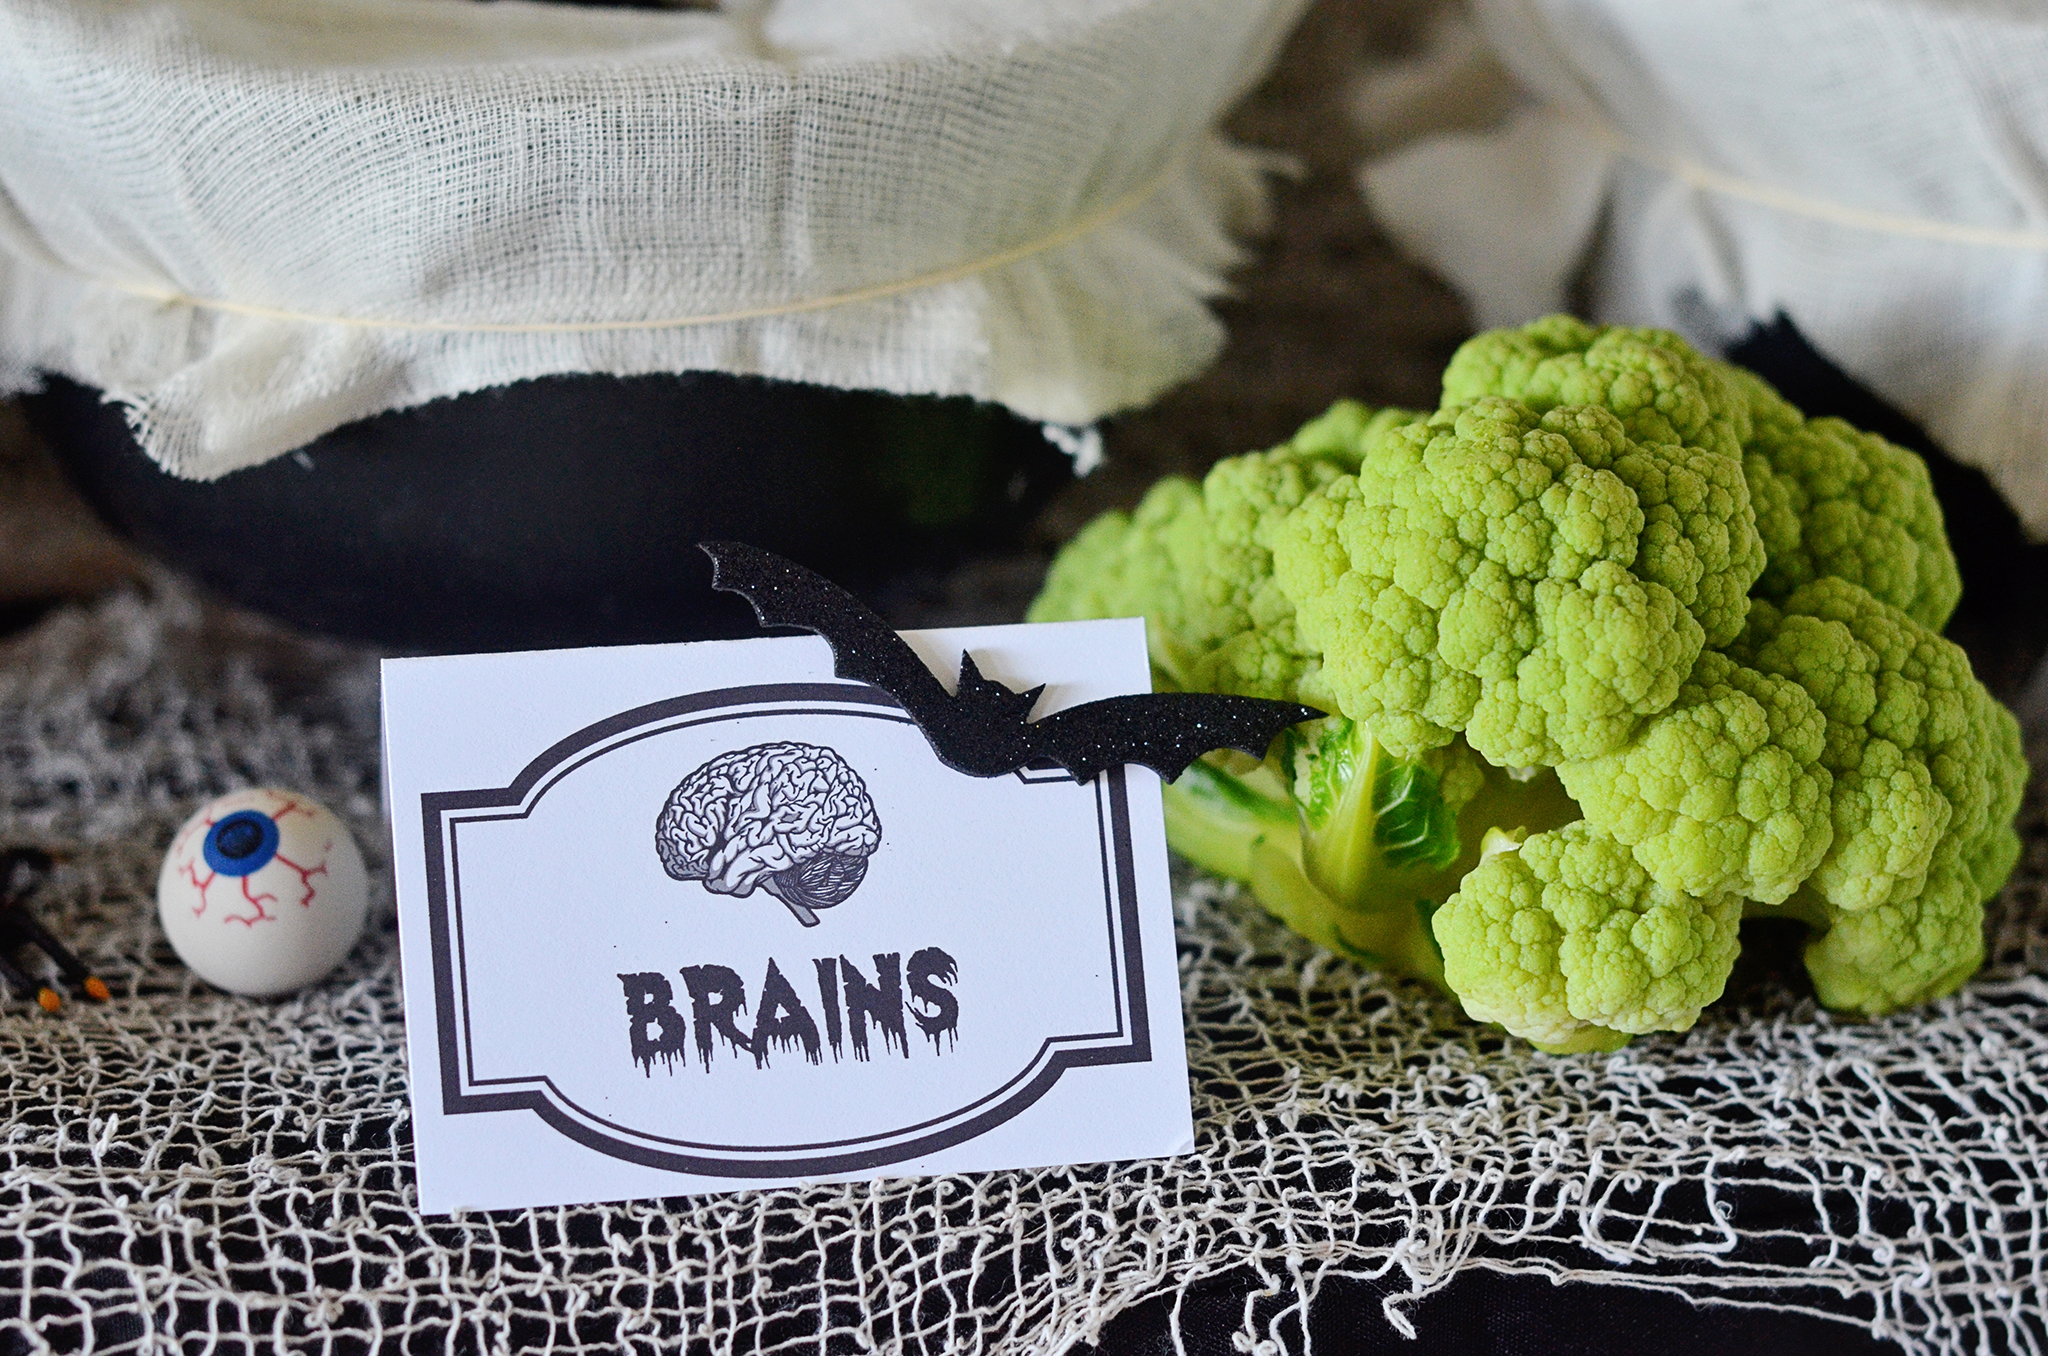 Brains! Boiled green cauliflower